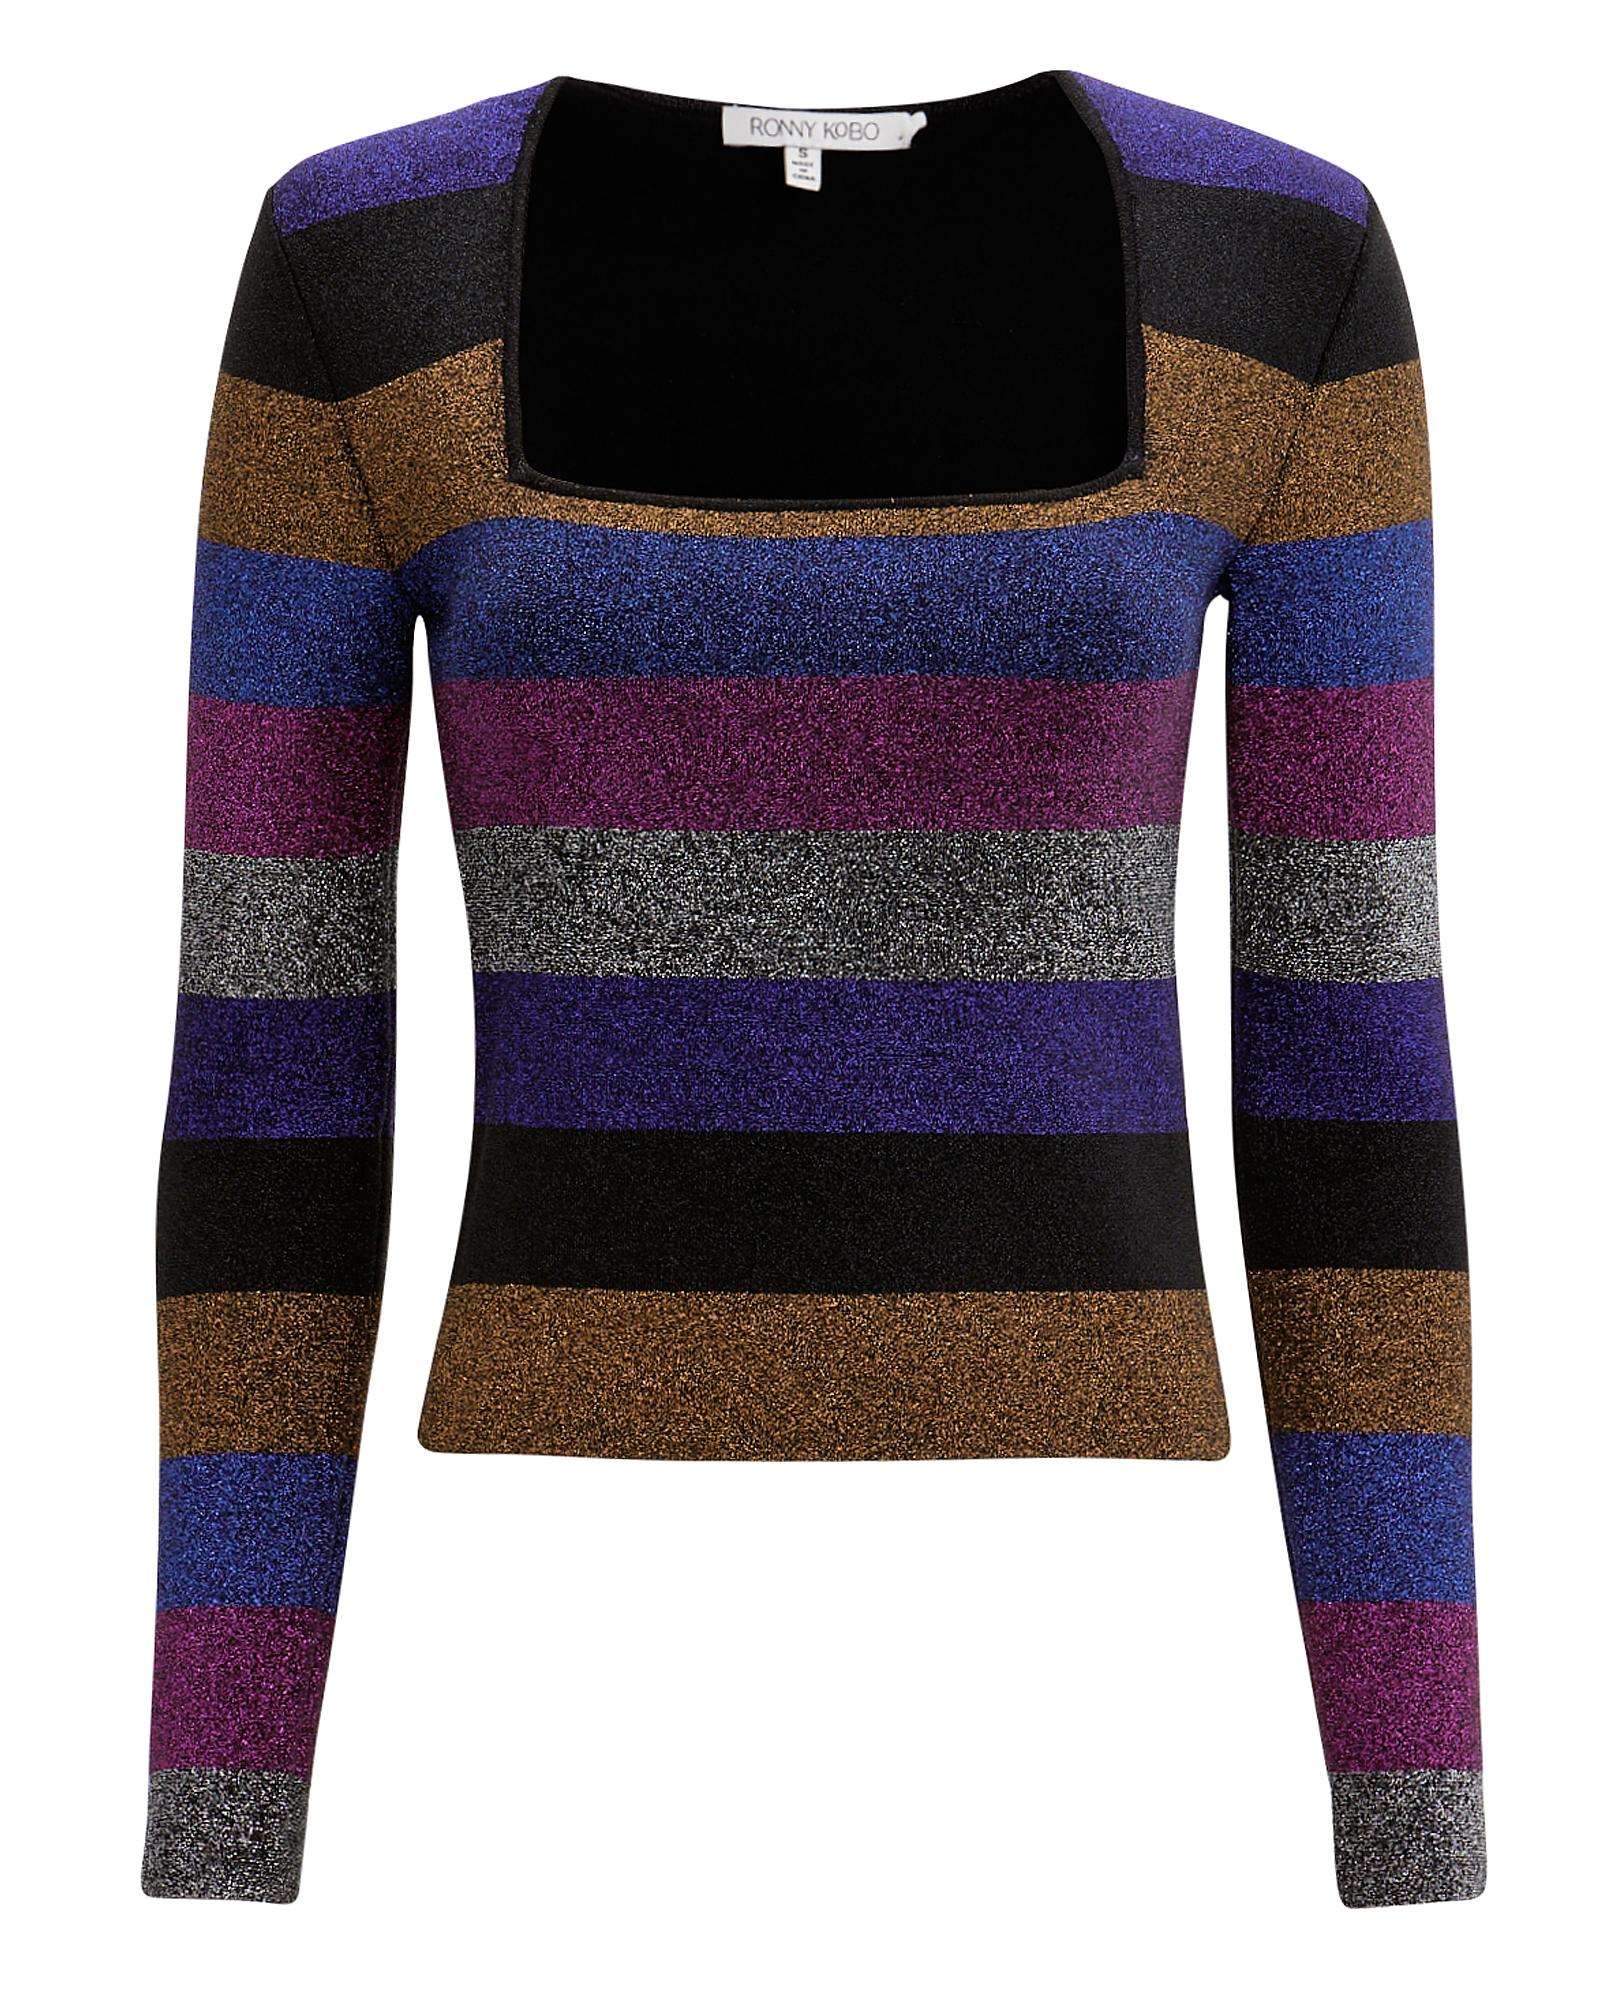 TORN Ronny Kobo Etallic Stripe Top Black/Silver/Purple